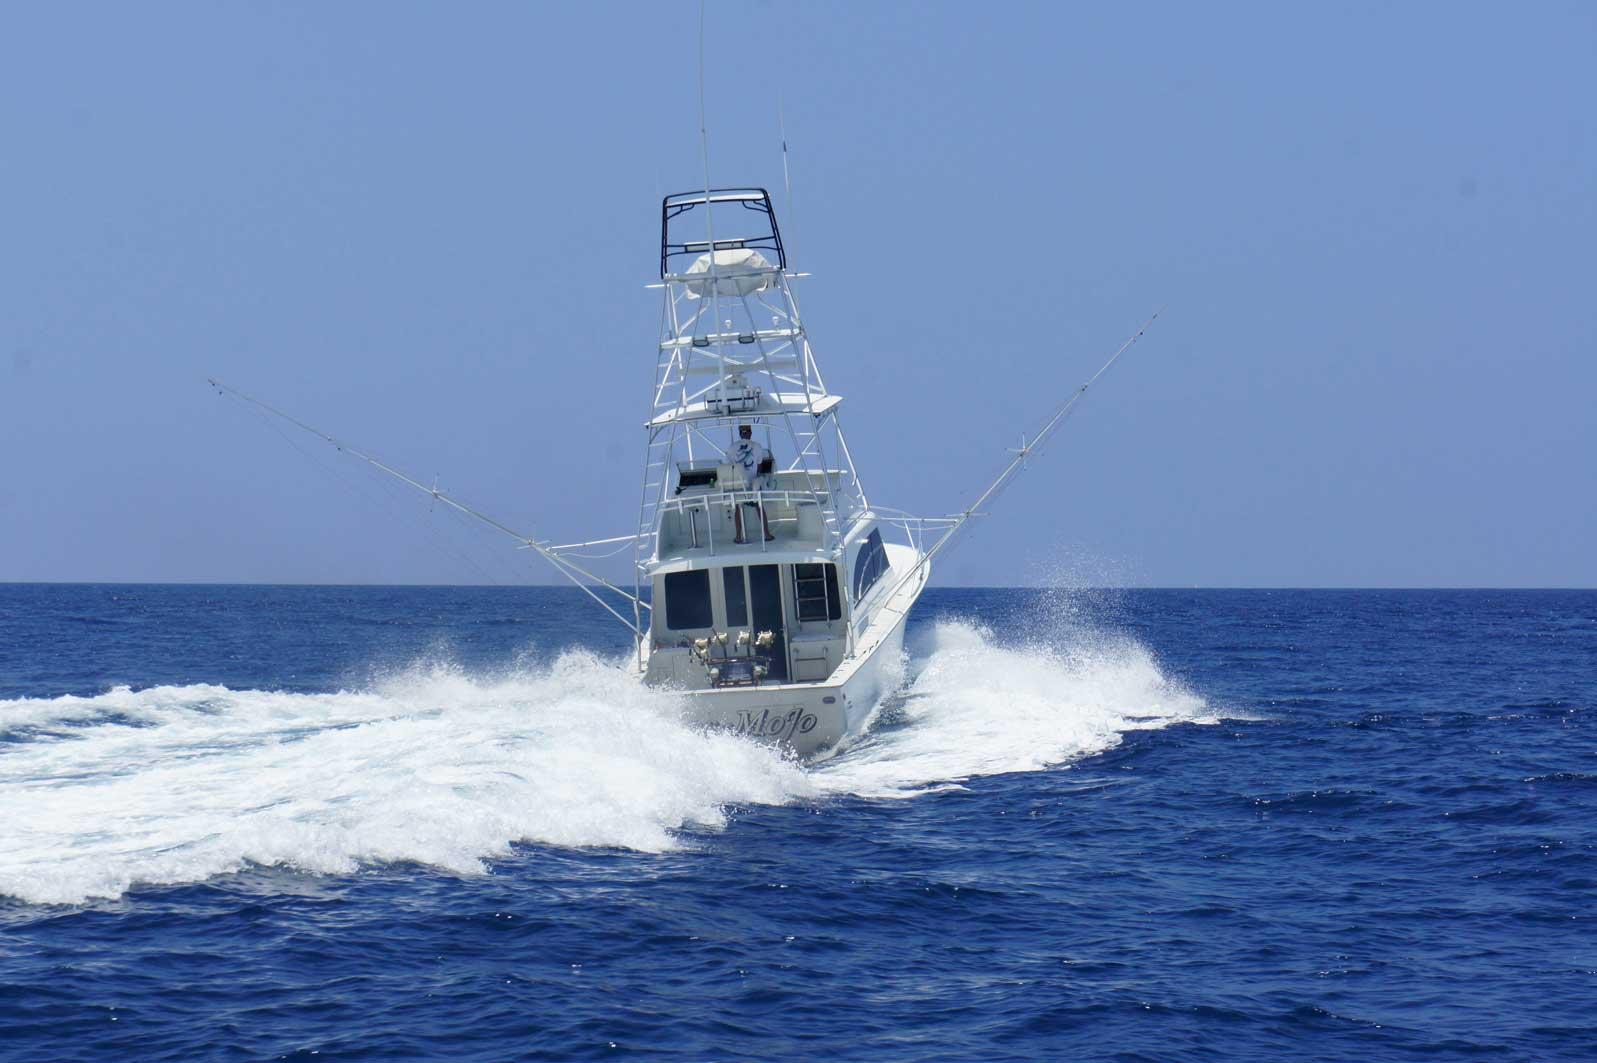 miss-mojo-fishing-charter-cover-01.jpg